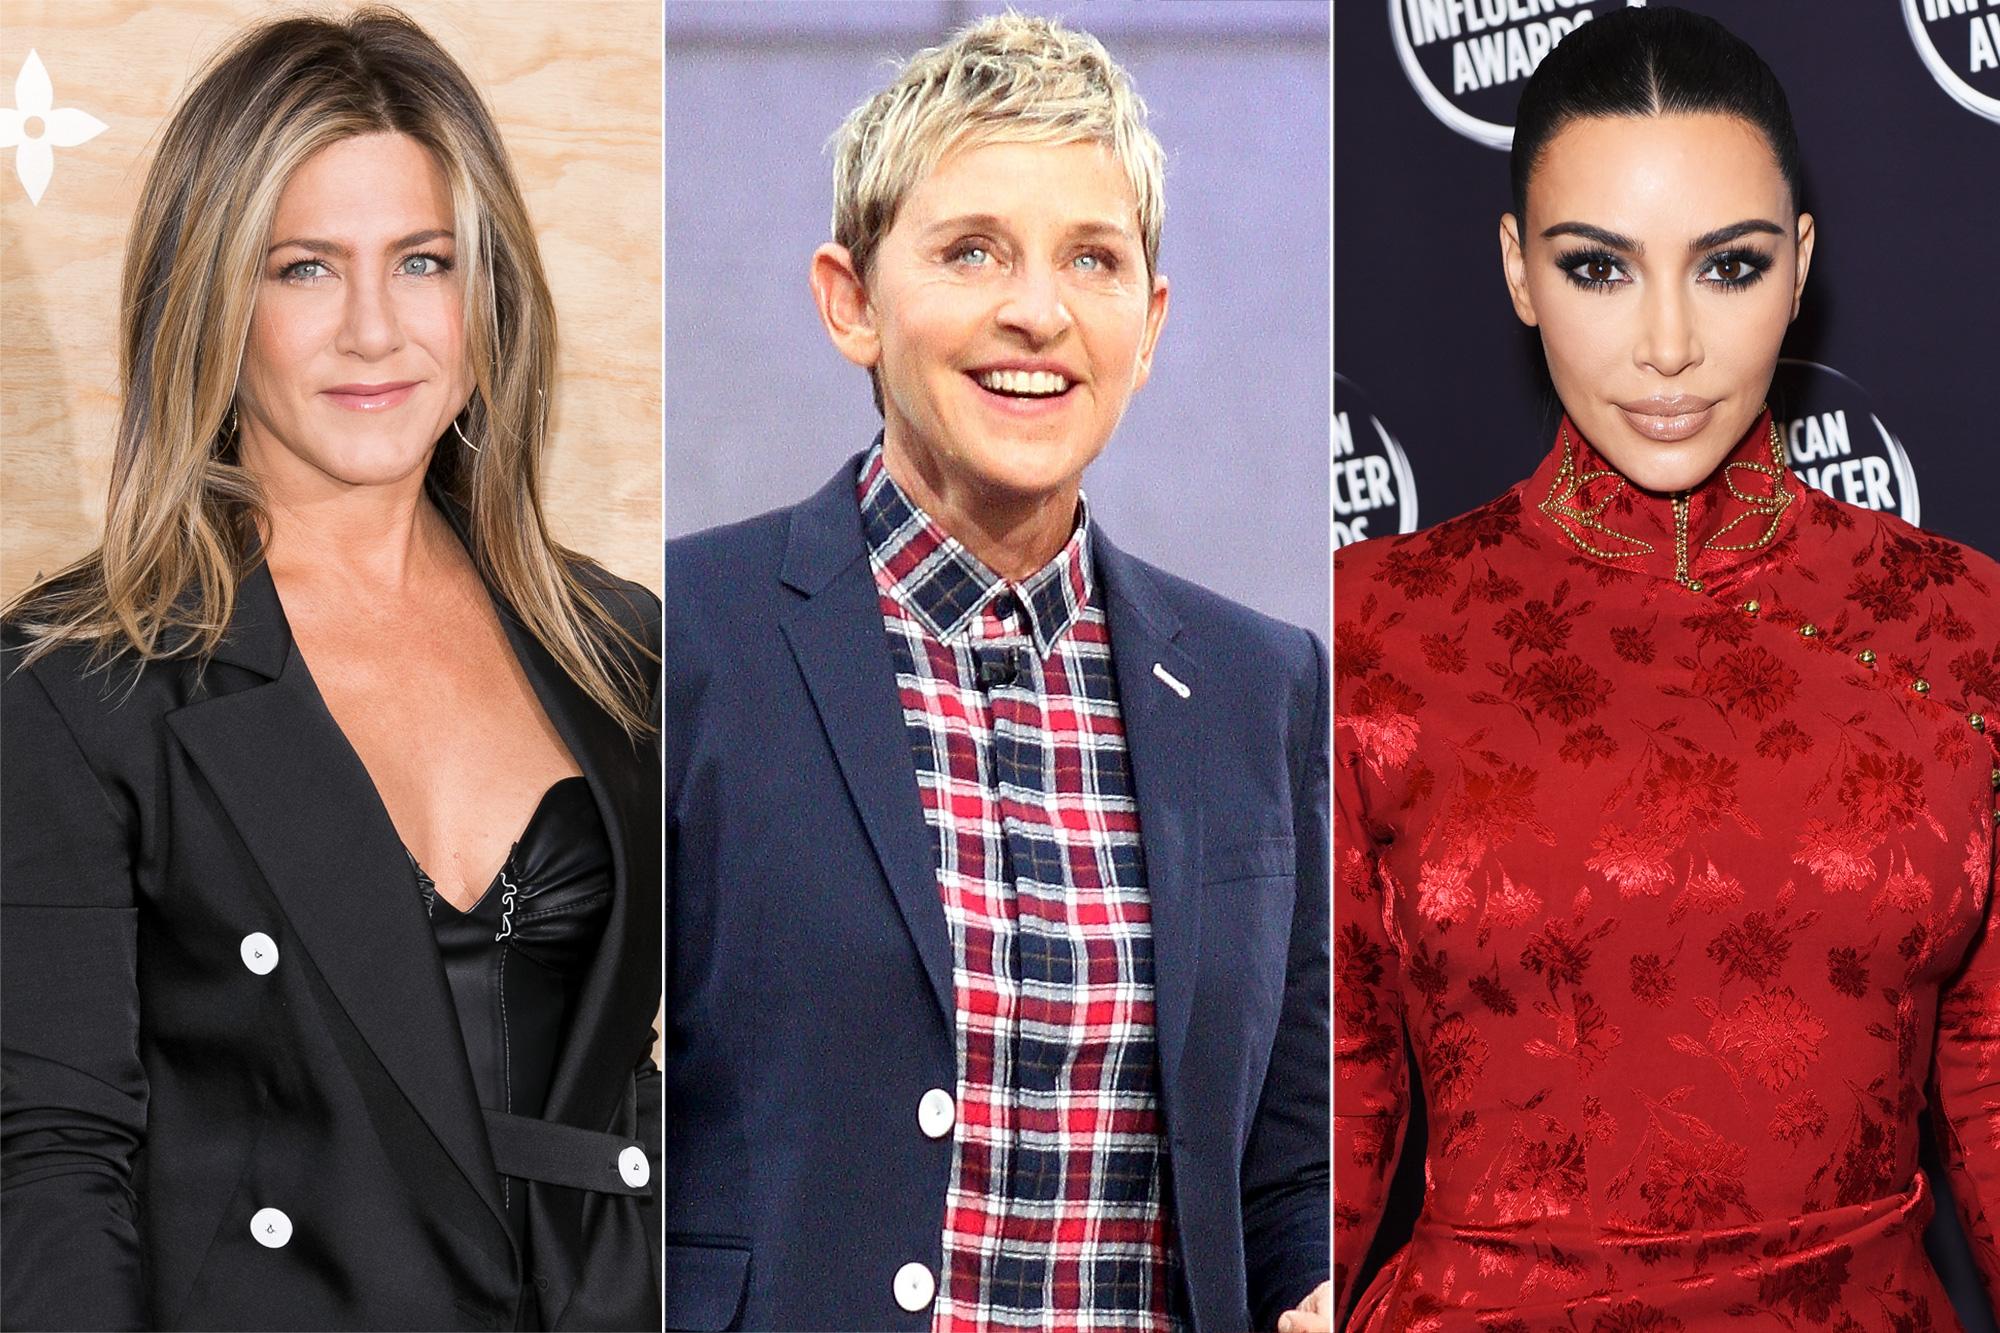 Jennifer Aniston, Ellen DeGeneres, and Kim Kardashian